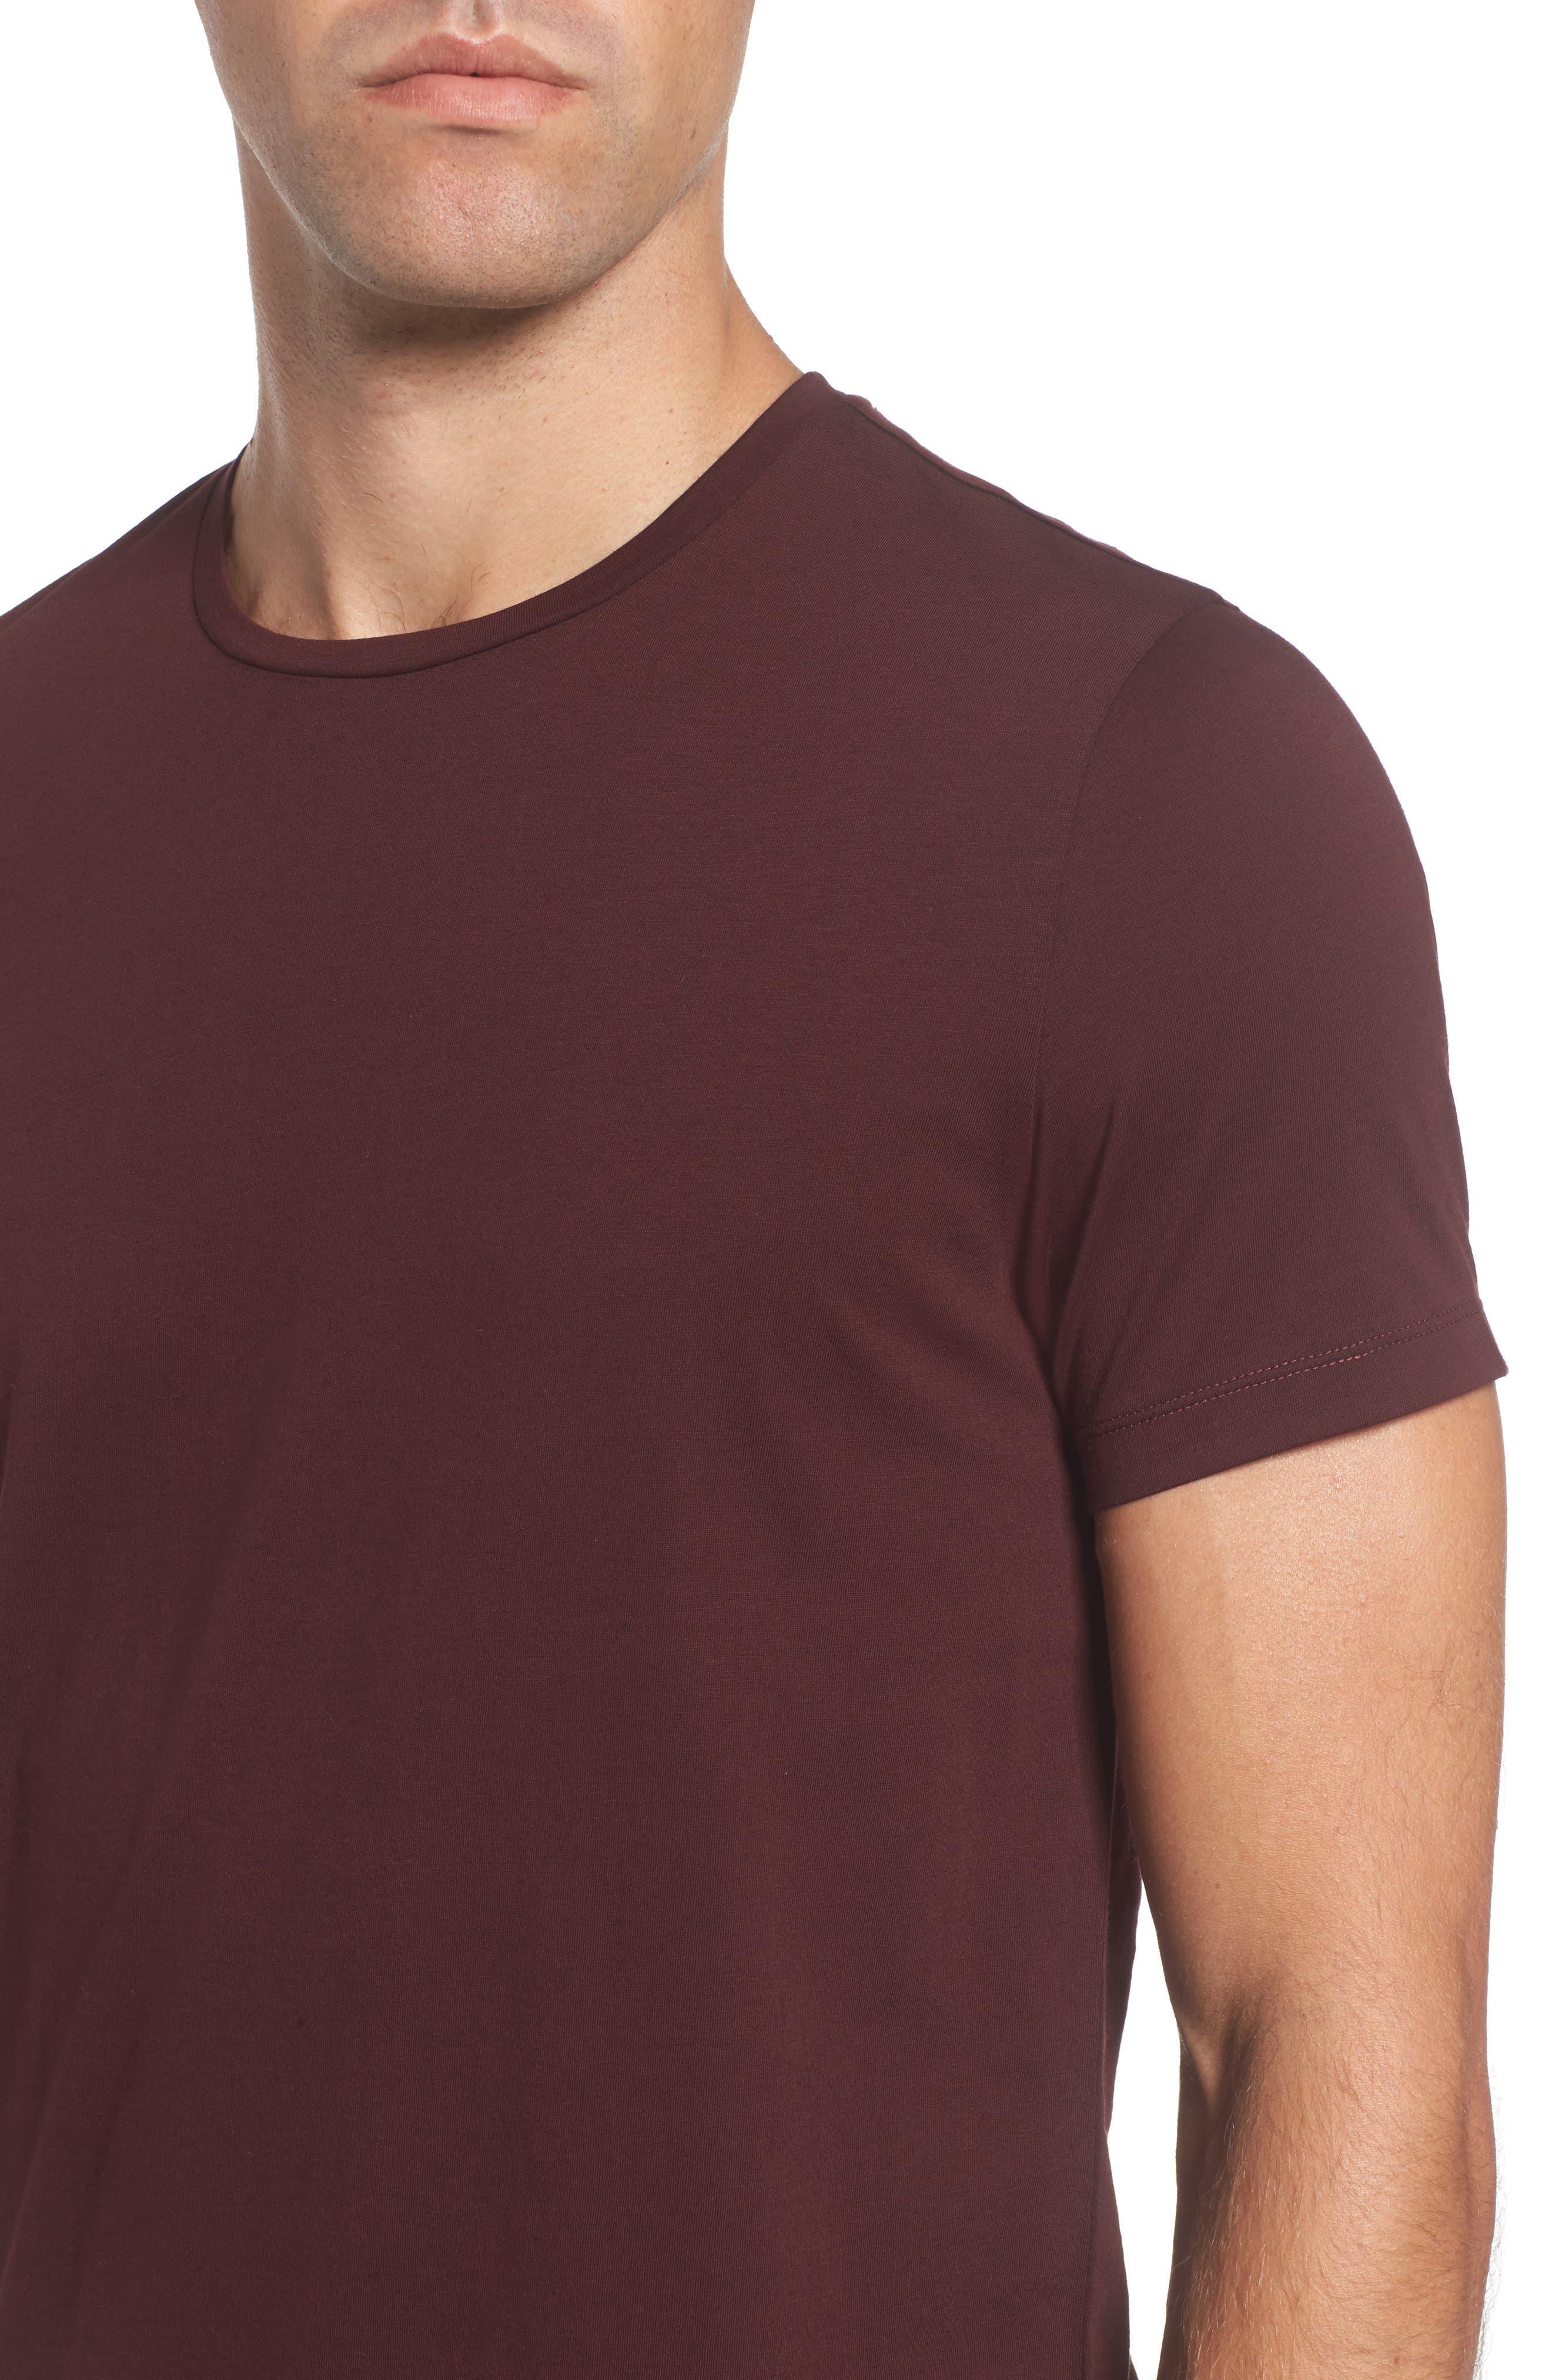 Tessler Crewneck T-Shirt,                             Alternate thumbnail 9, color,                             Black